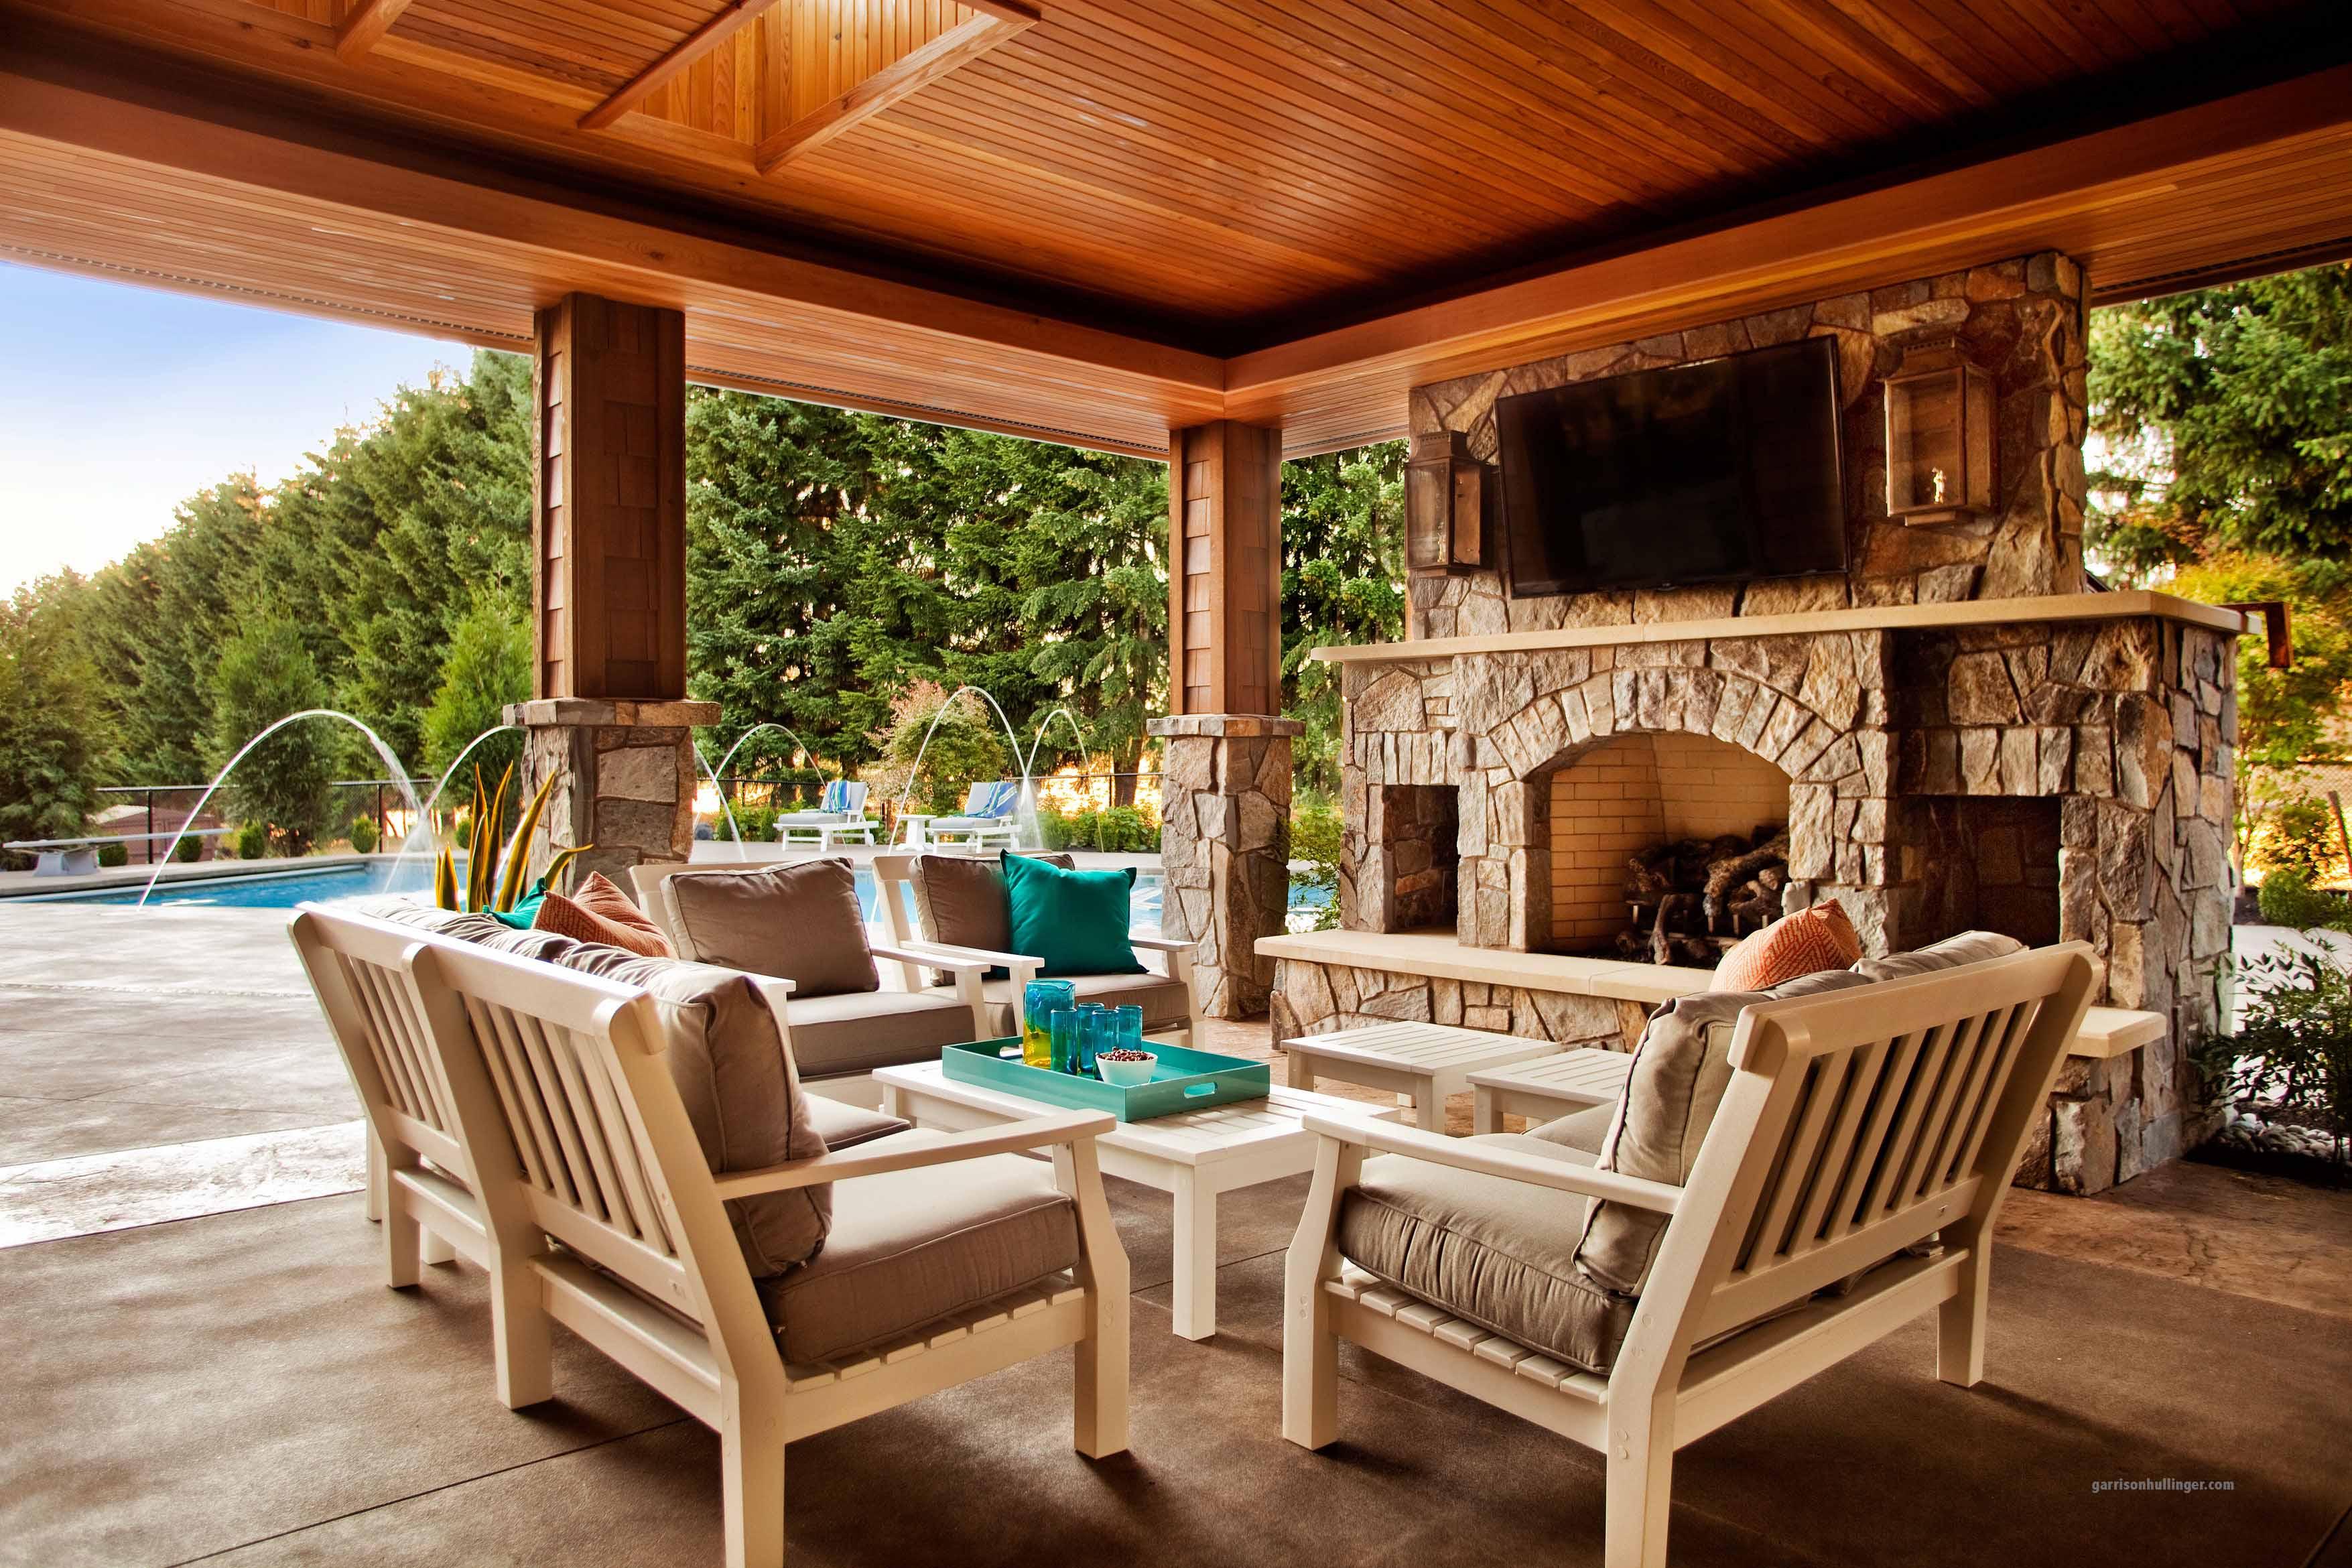 15 Incredible Rustic Outdoor Design ideas on Rustic Backyard Ideas id=24264